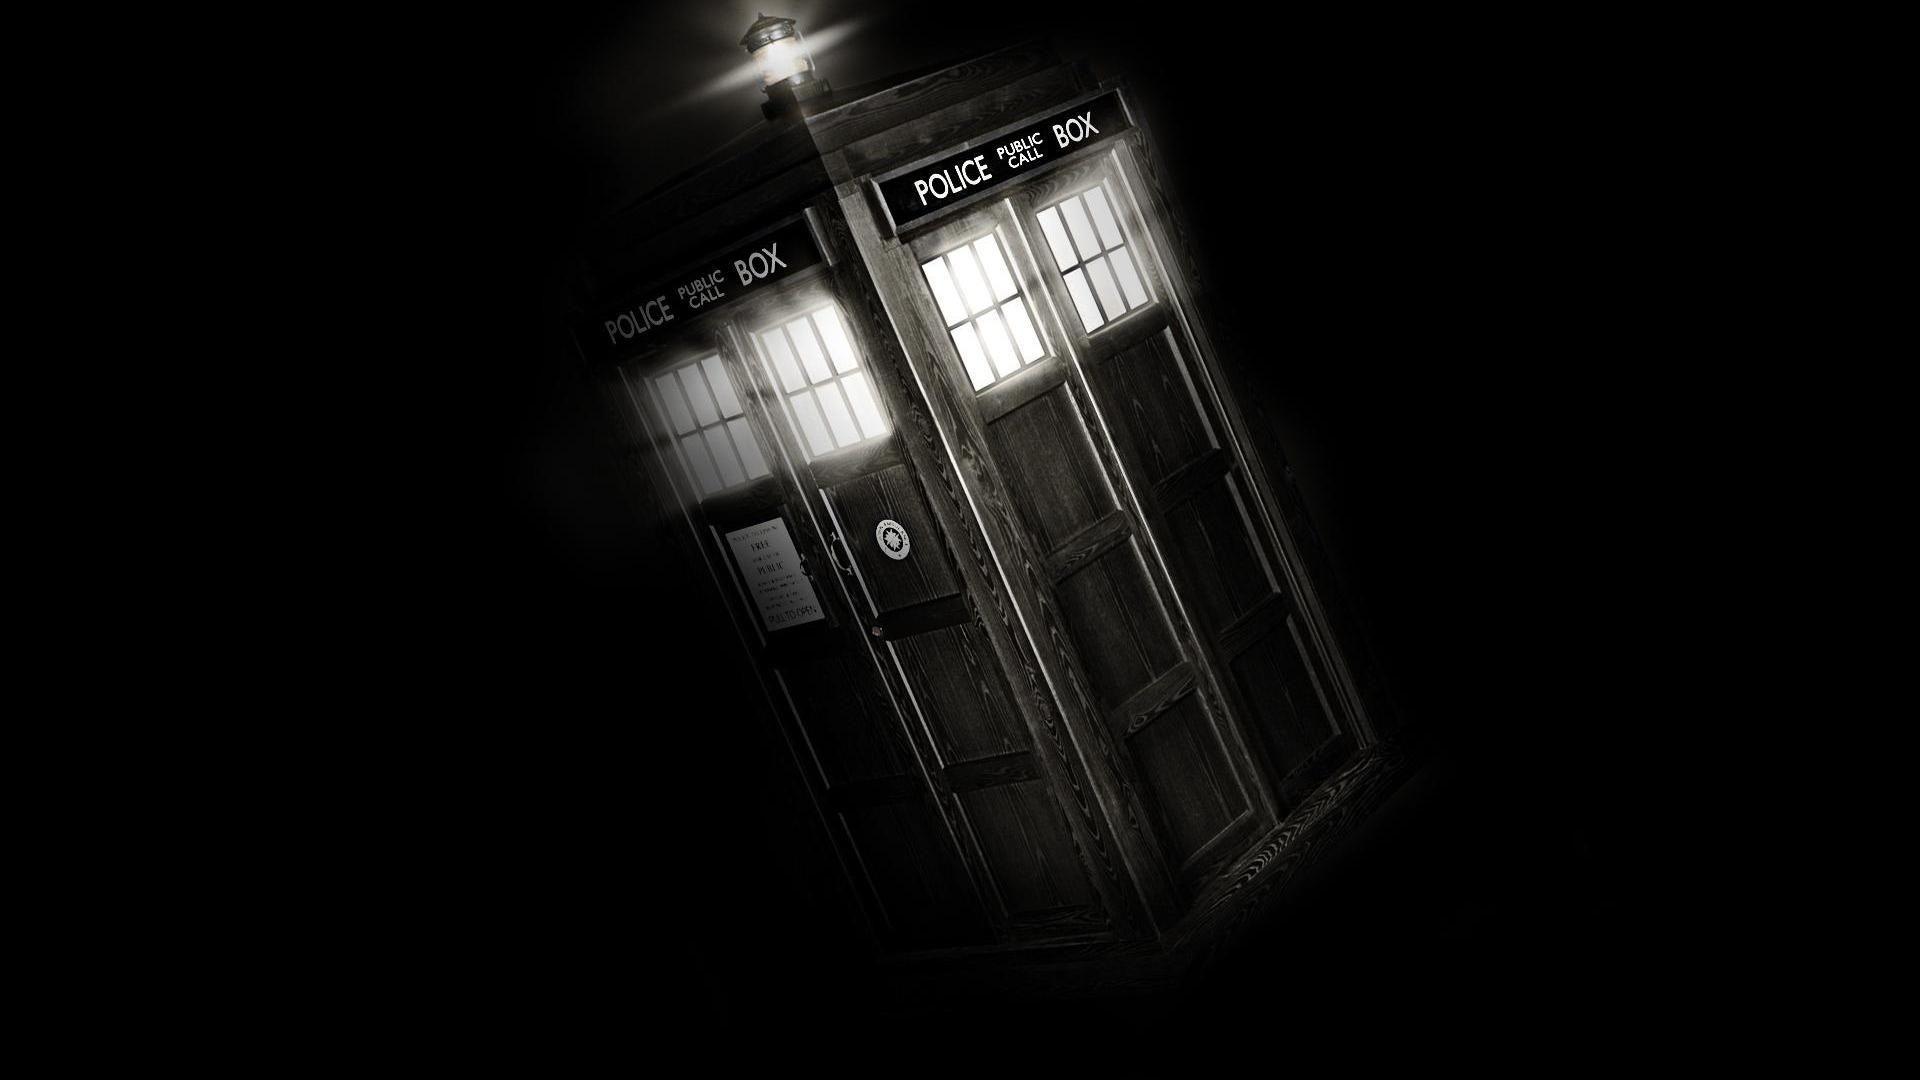 Res: 1920x1080, Doctor Who Tardis TV TARDIS Shows HD Wallpapers, Desktop .